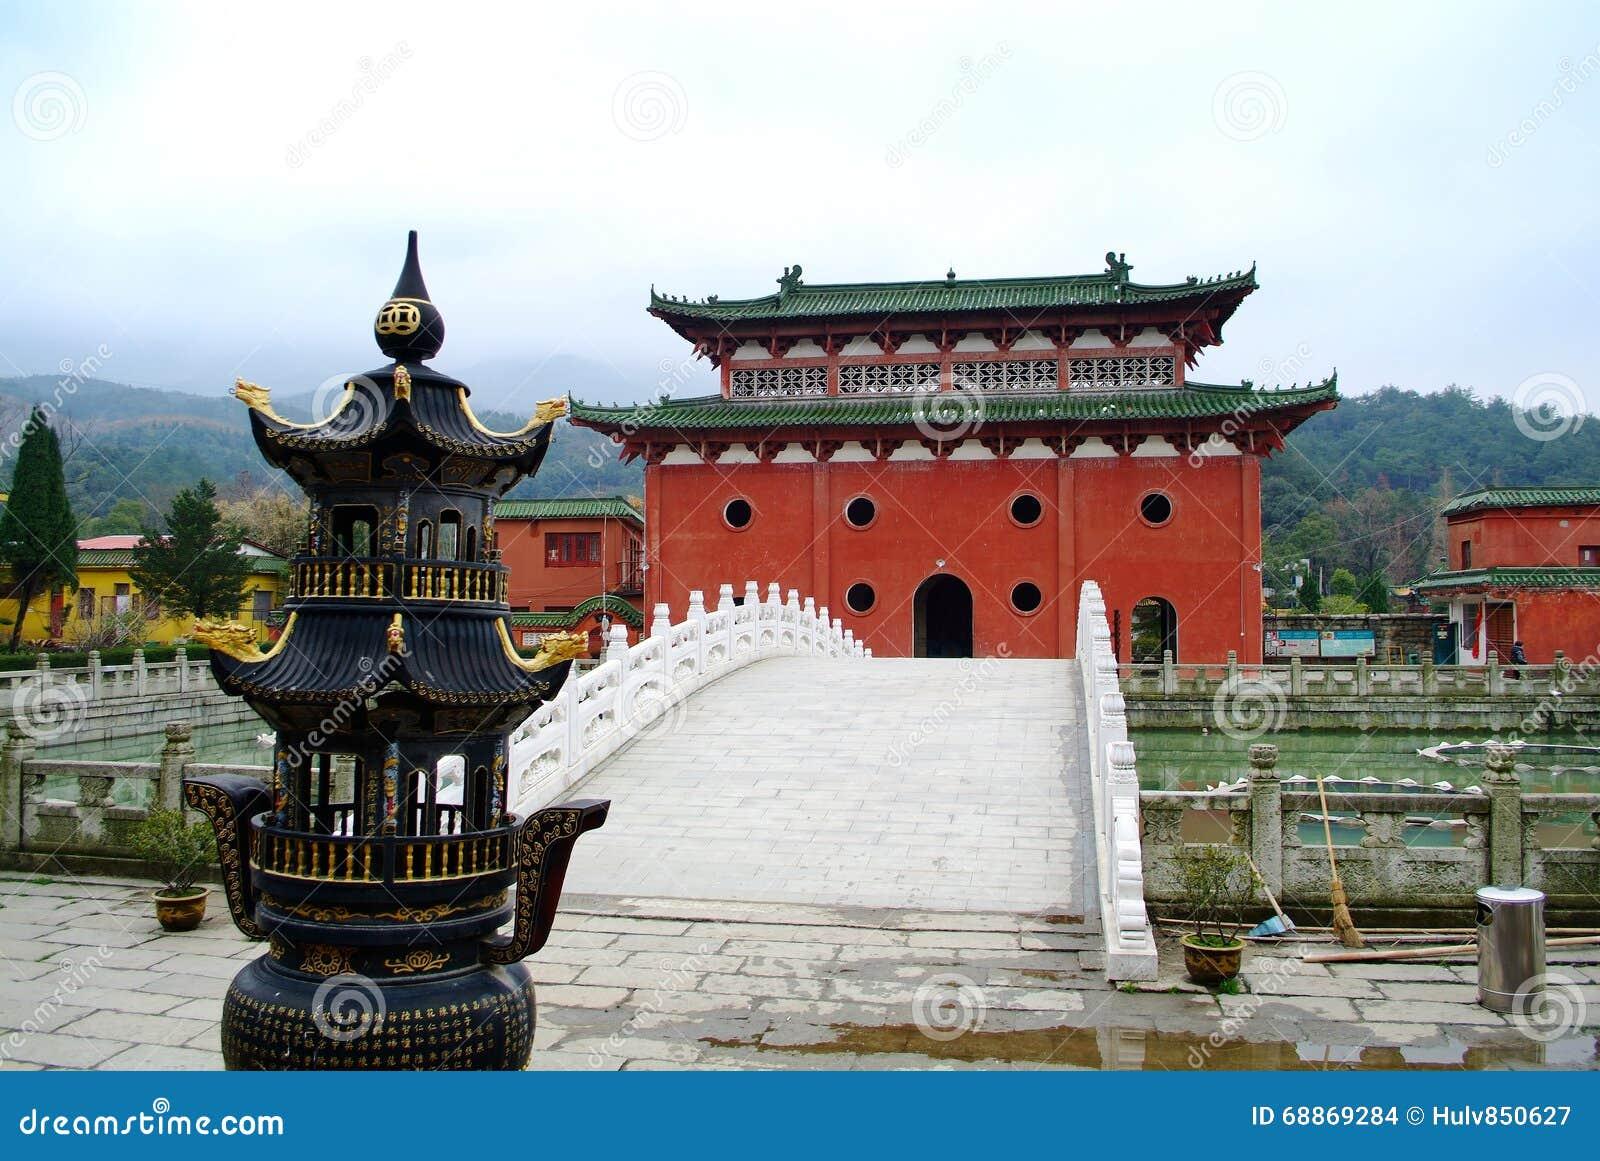 Temple , China